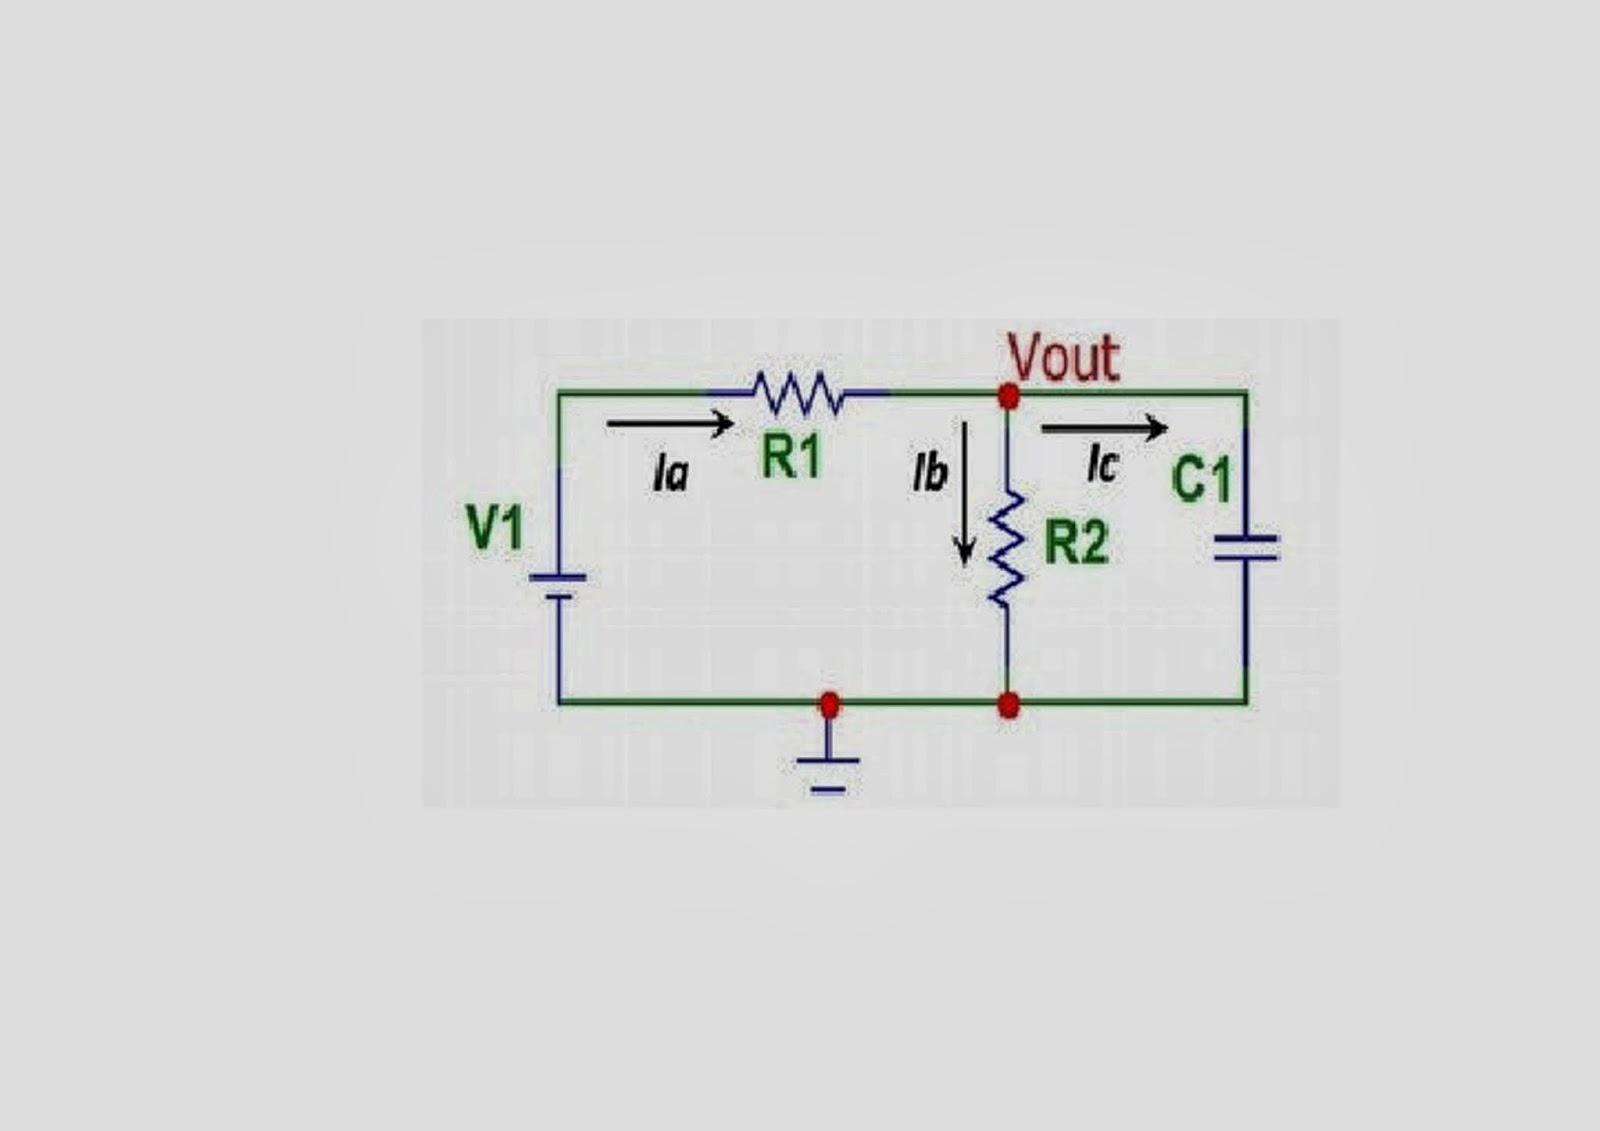 Circuito Rc : Edublogdegavino: circuito rc paralelo